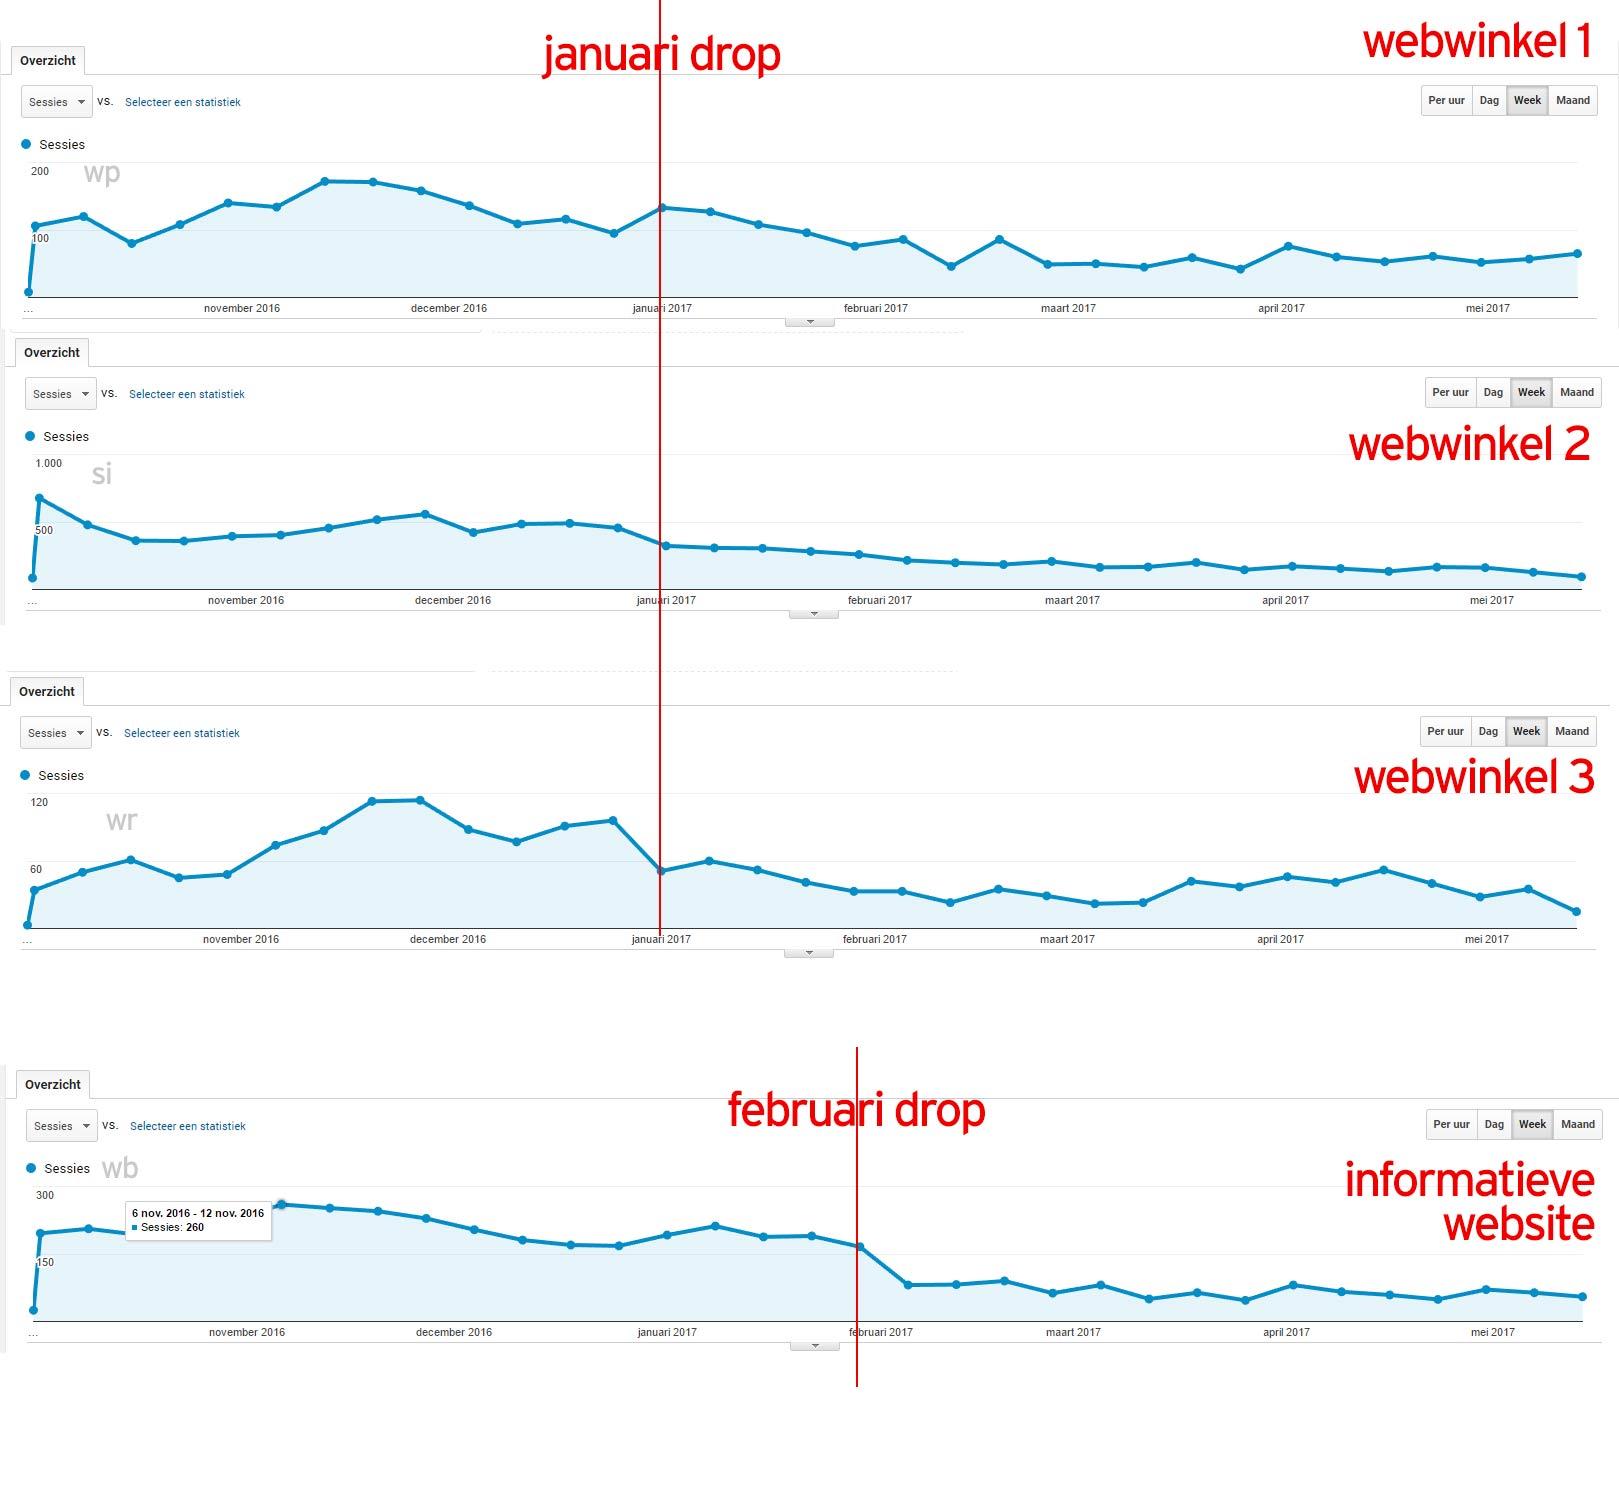 Sinds 1 Januari bij vele websites dalingen?-untitled-jpg